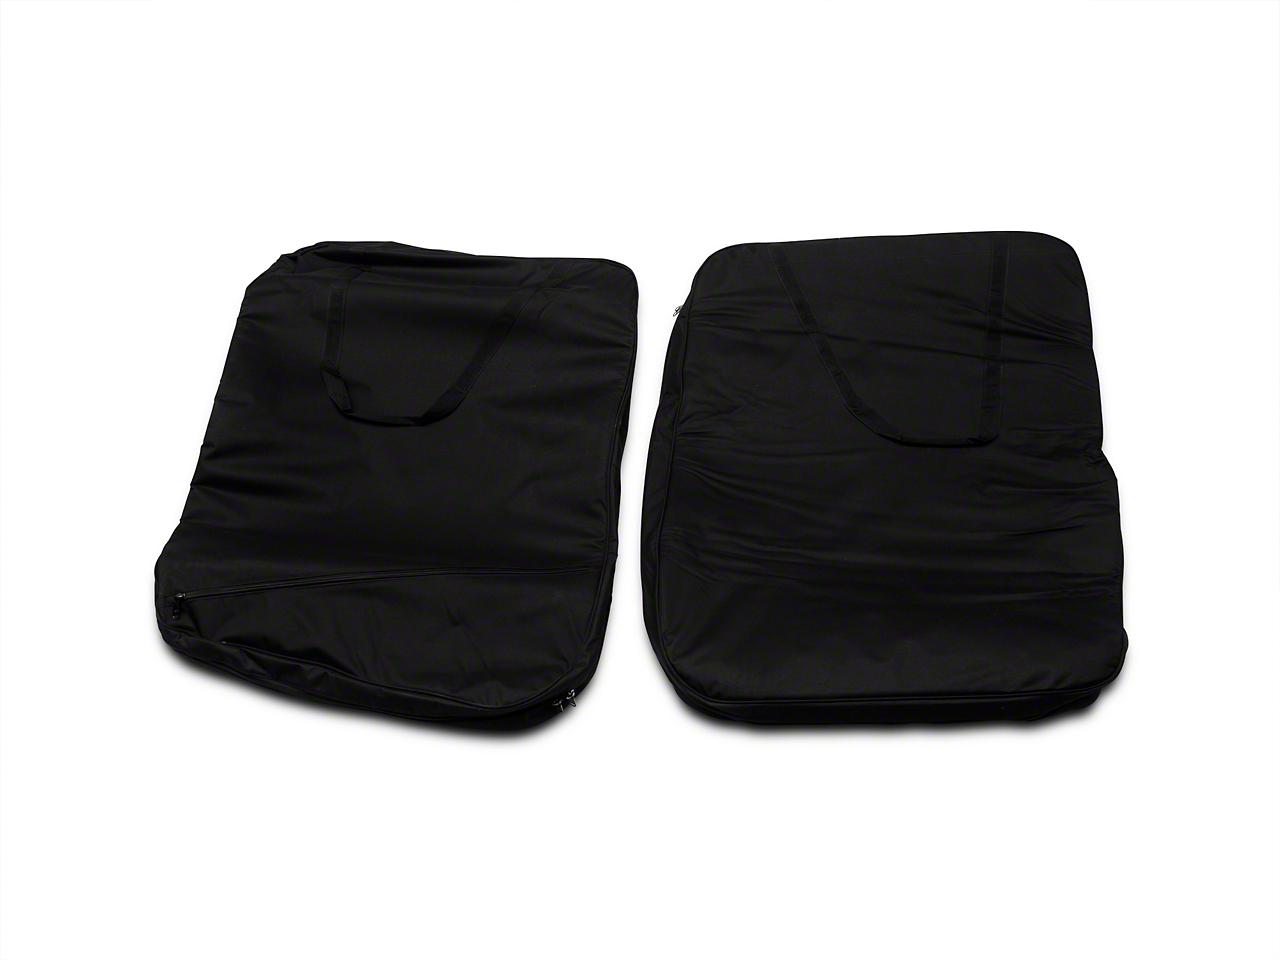 Smittybilt Storage Bag - Hard Doors - Pair - Black (07-18 Jeep Wrangler JK)